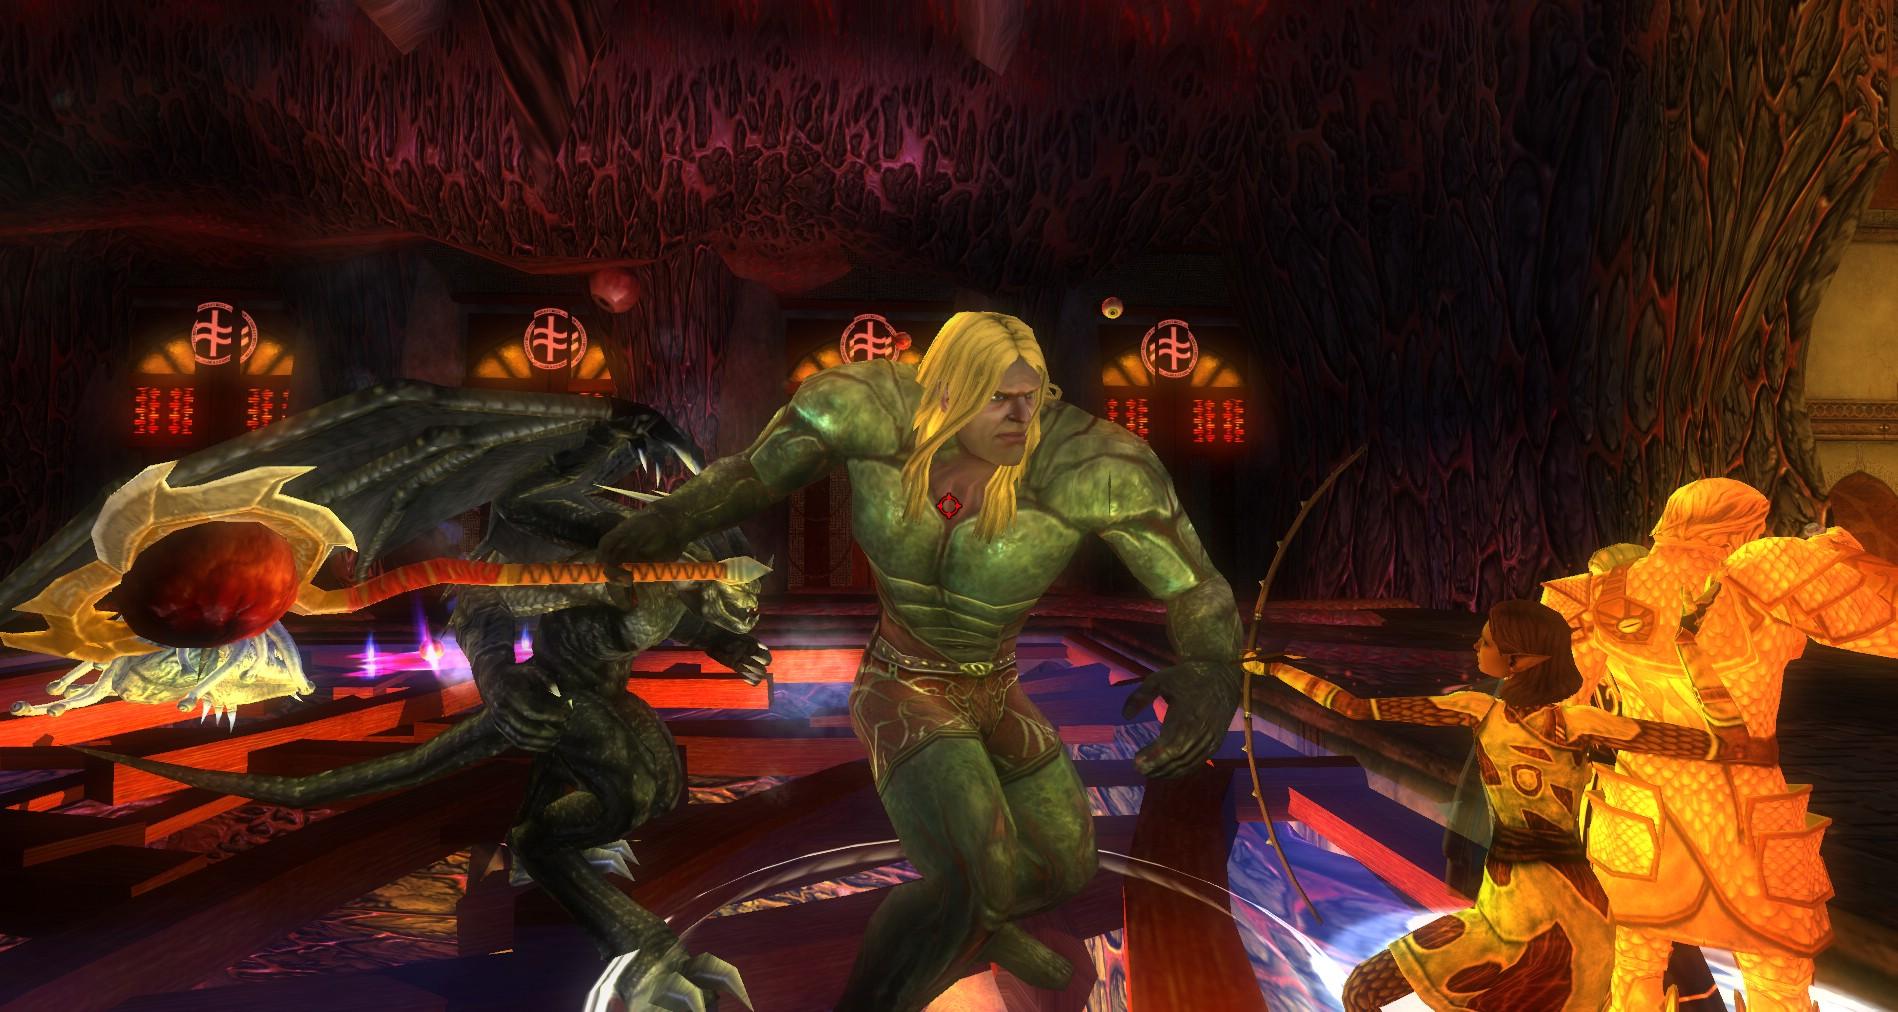 u10-lord-of-eyes-boss-fight